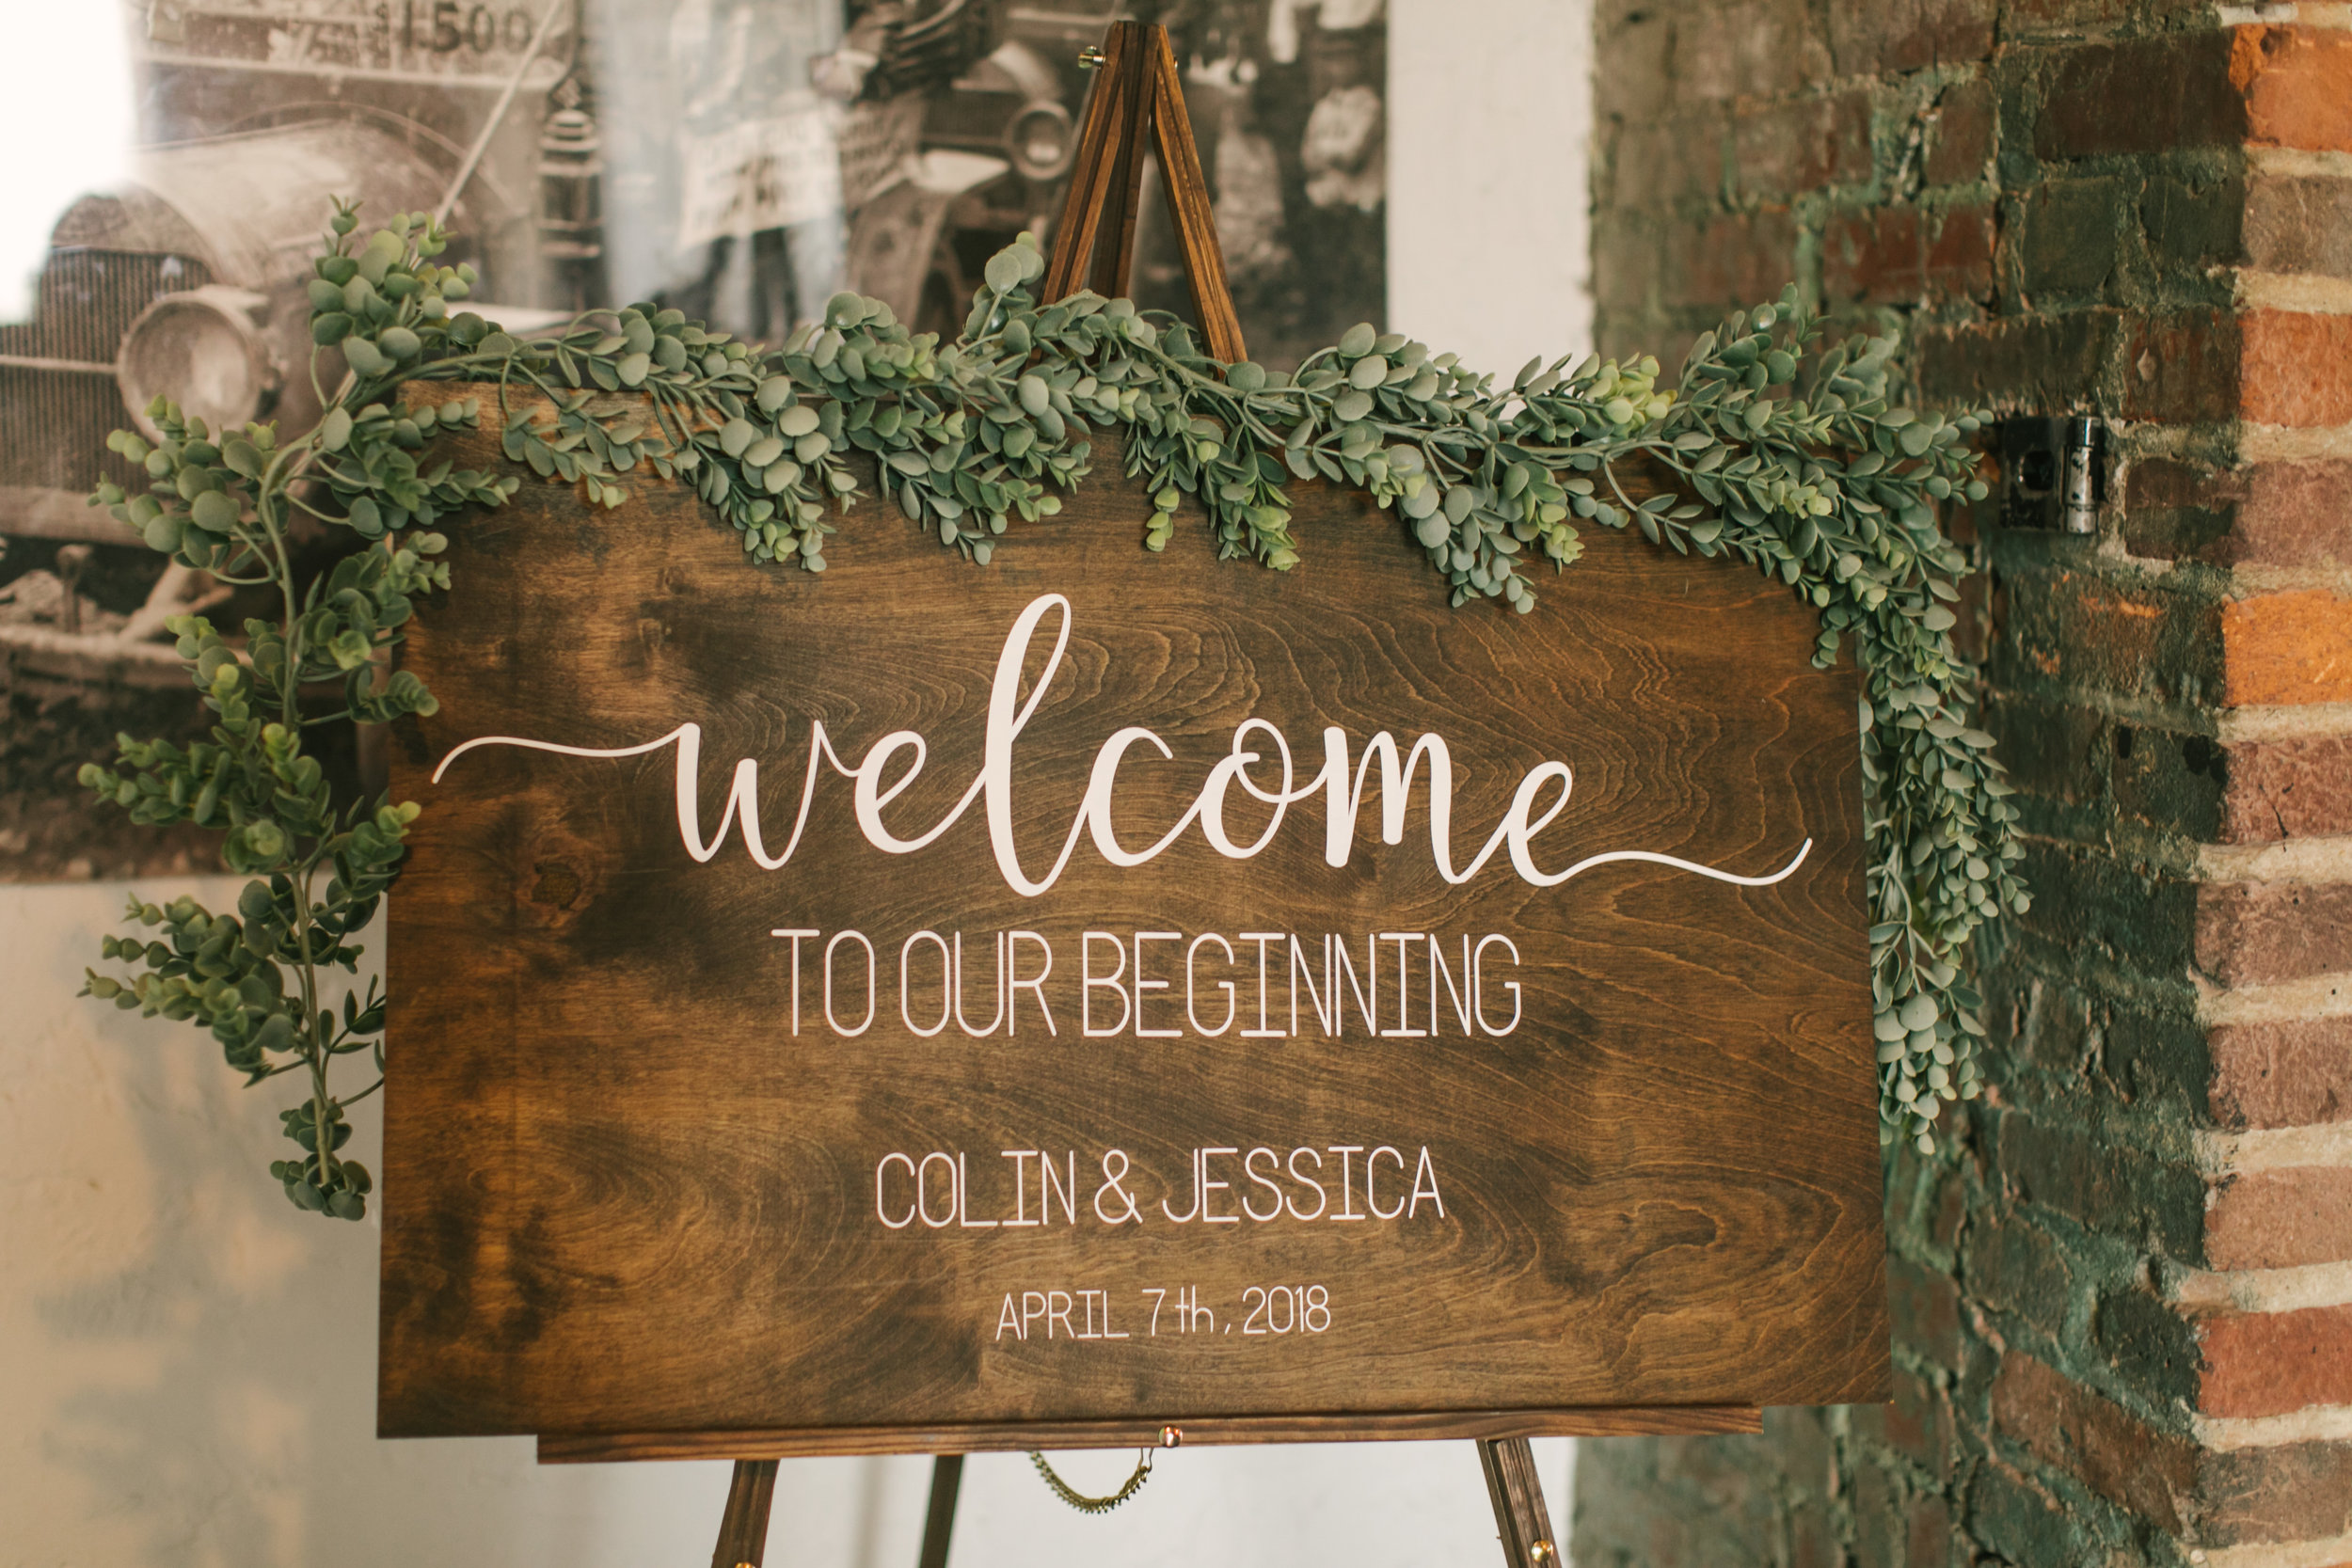 407_Colin+Jessica_Wedding.jpg